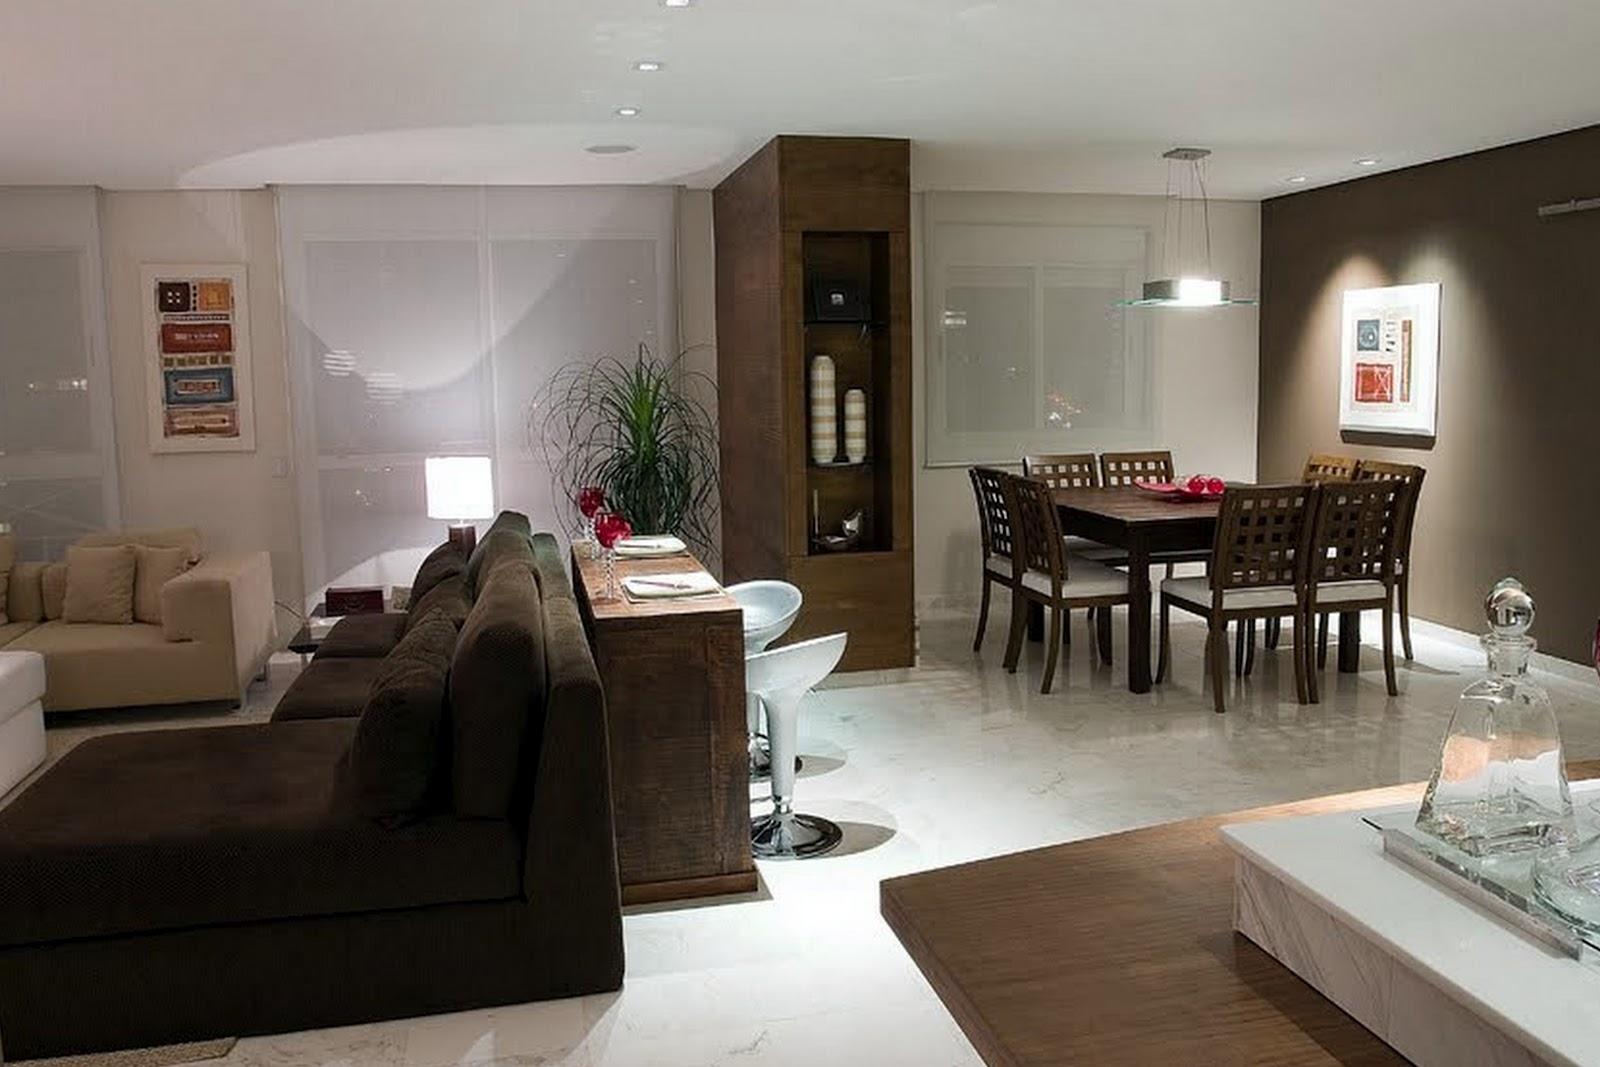 sala+jantar+e+sala+de+estar+(12)jpg